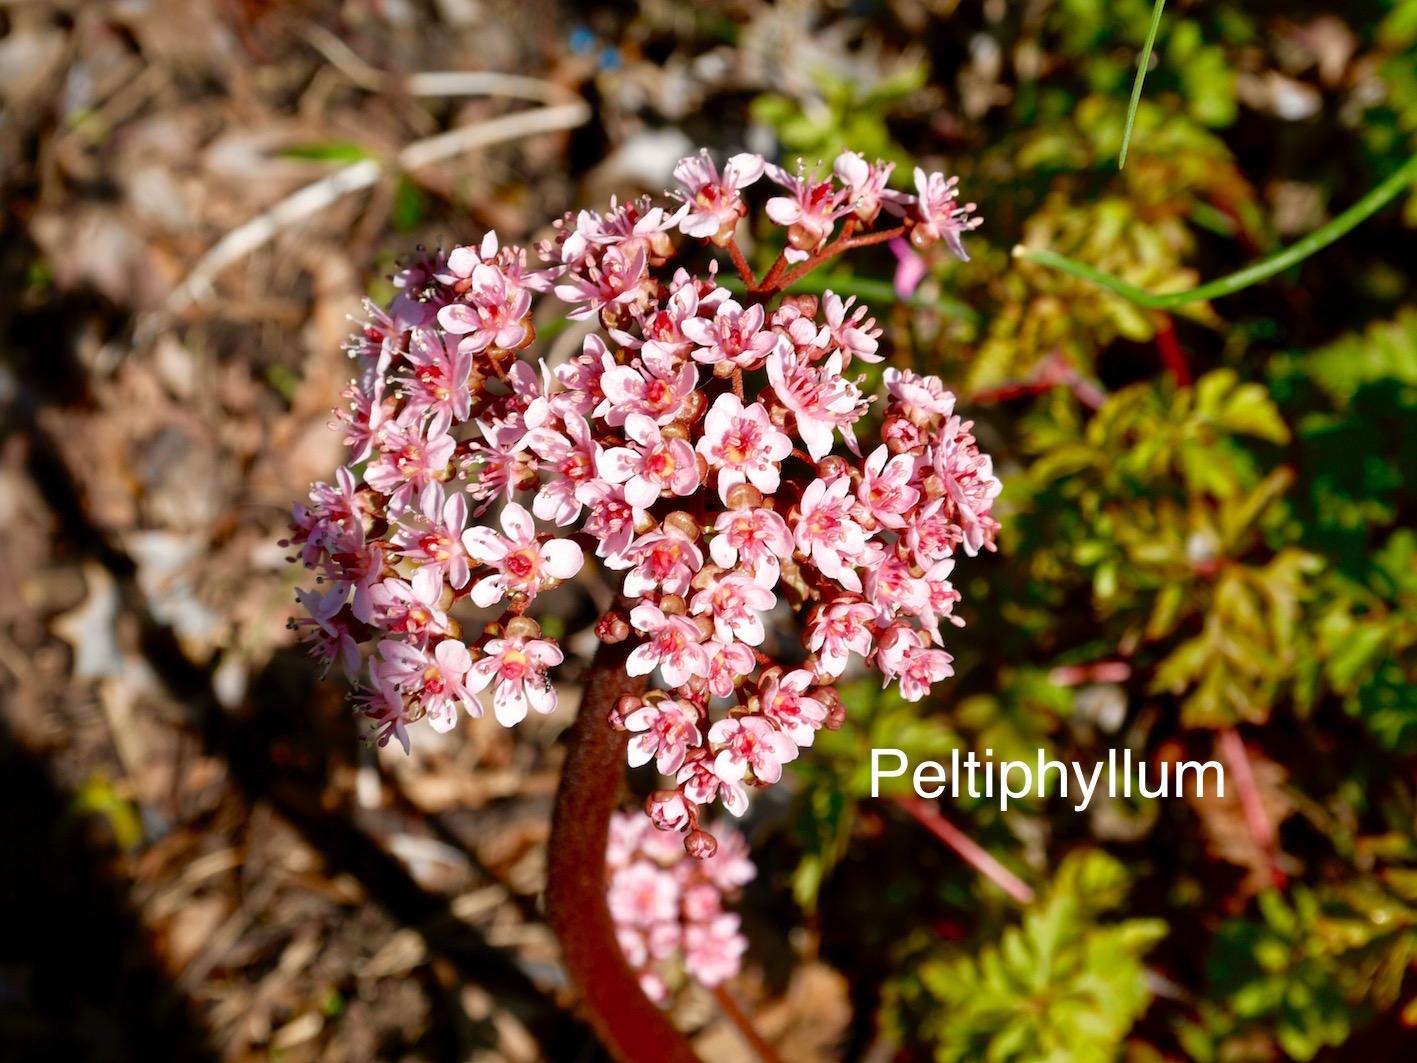 Peltiphyllum